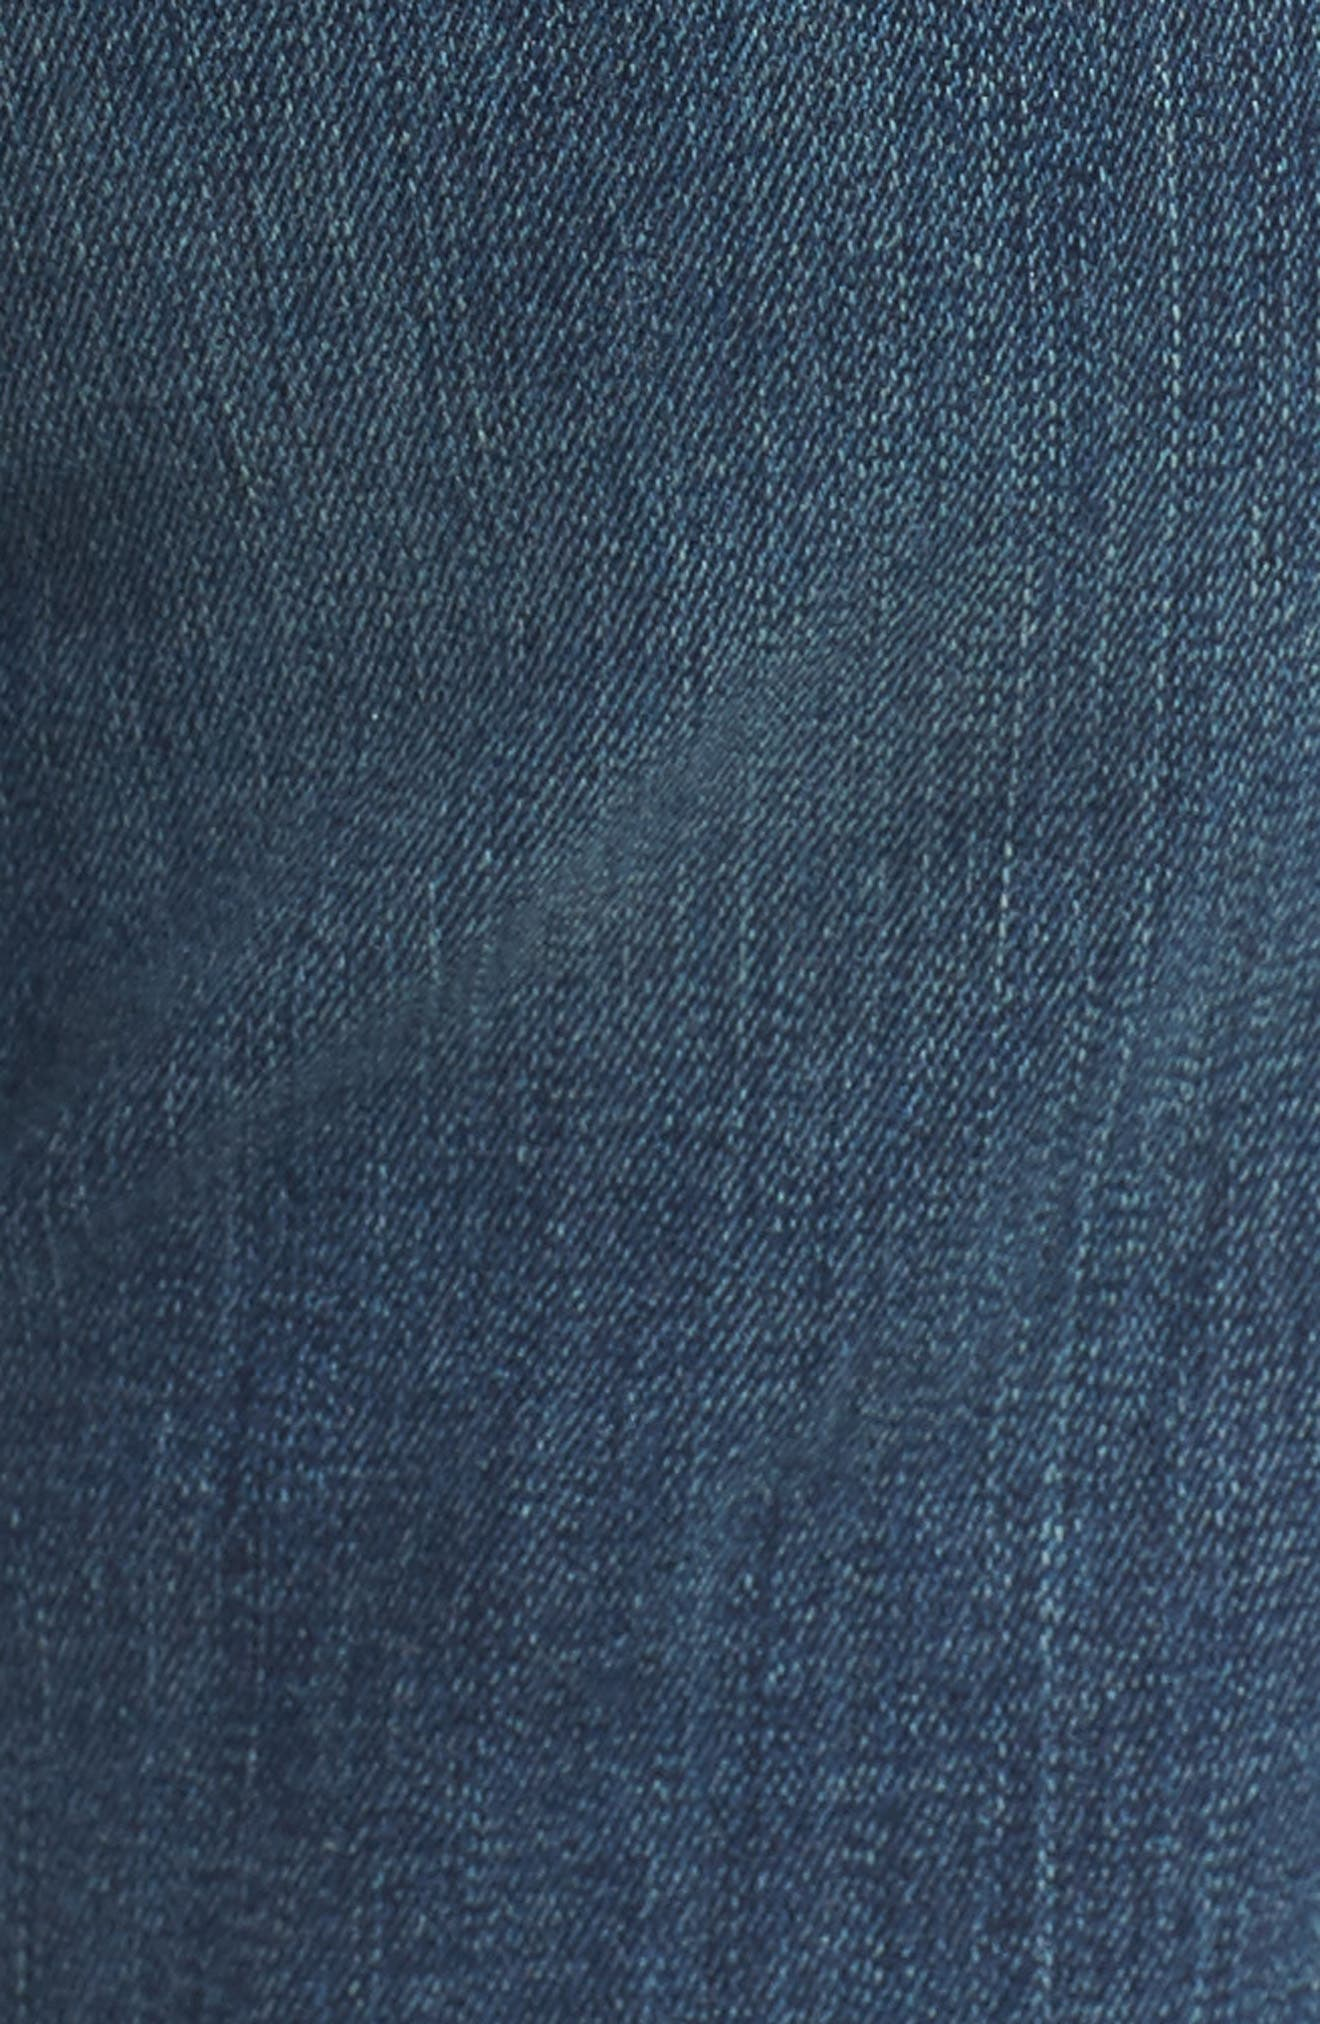 'Dayla' Colored Wide Cuff Capri Jeans,                             Alternate thumbnail 67, color,